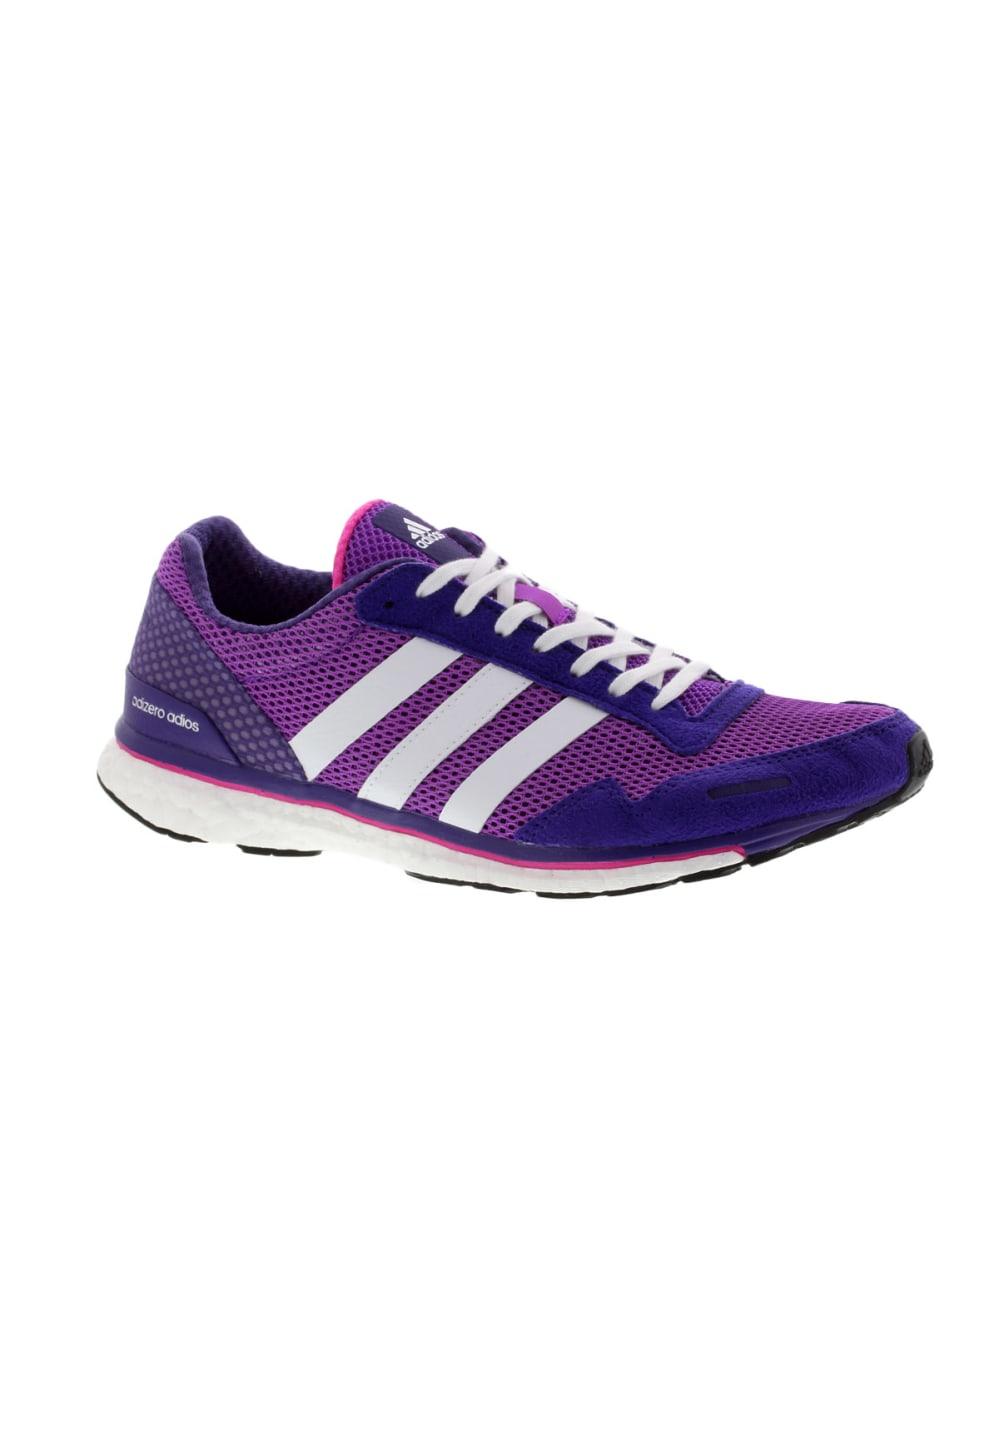 Adidas Adizero Adios 3 Laufschuhe F 252 R Damen Lila 21run